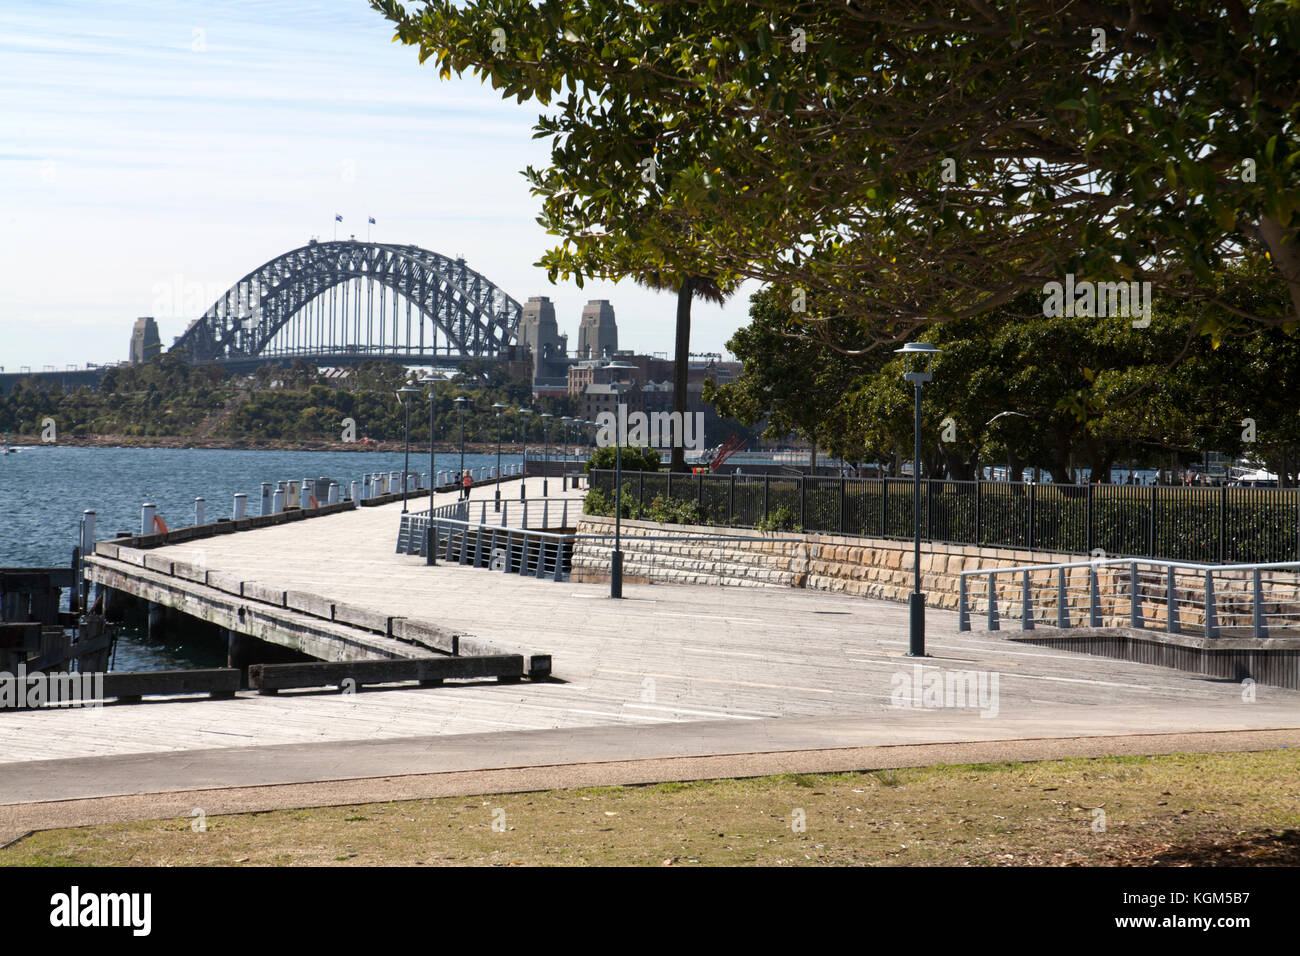 sydney harbour bridge from pyrmont park darling island pyrmont sydney new south wales australia - Stock Image